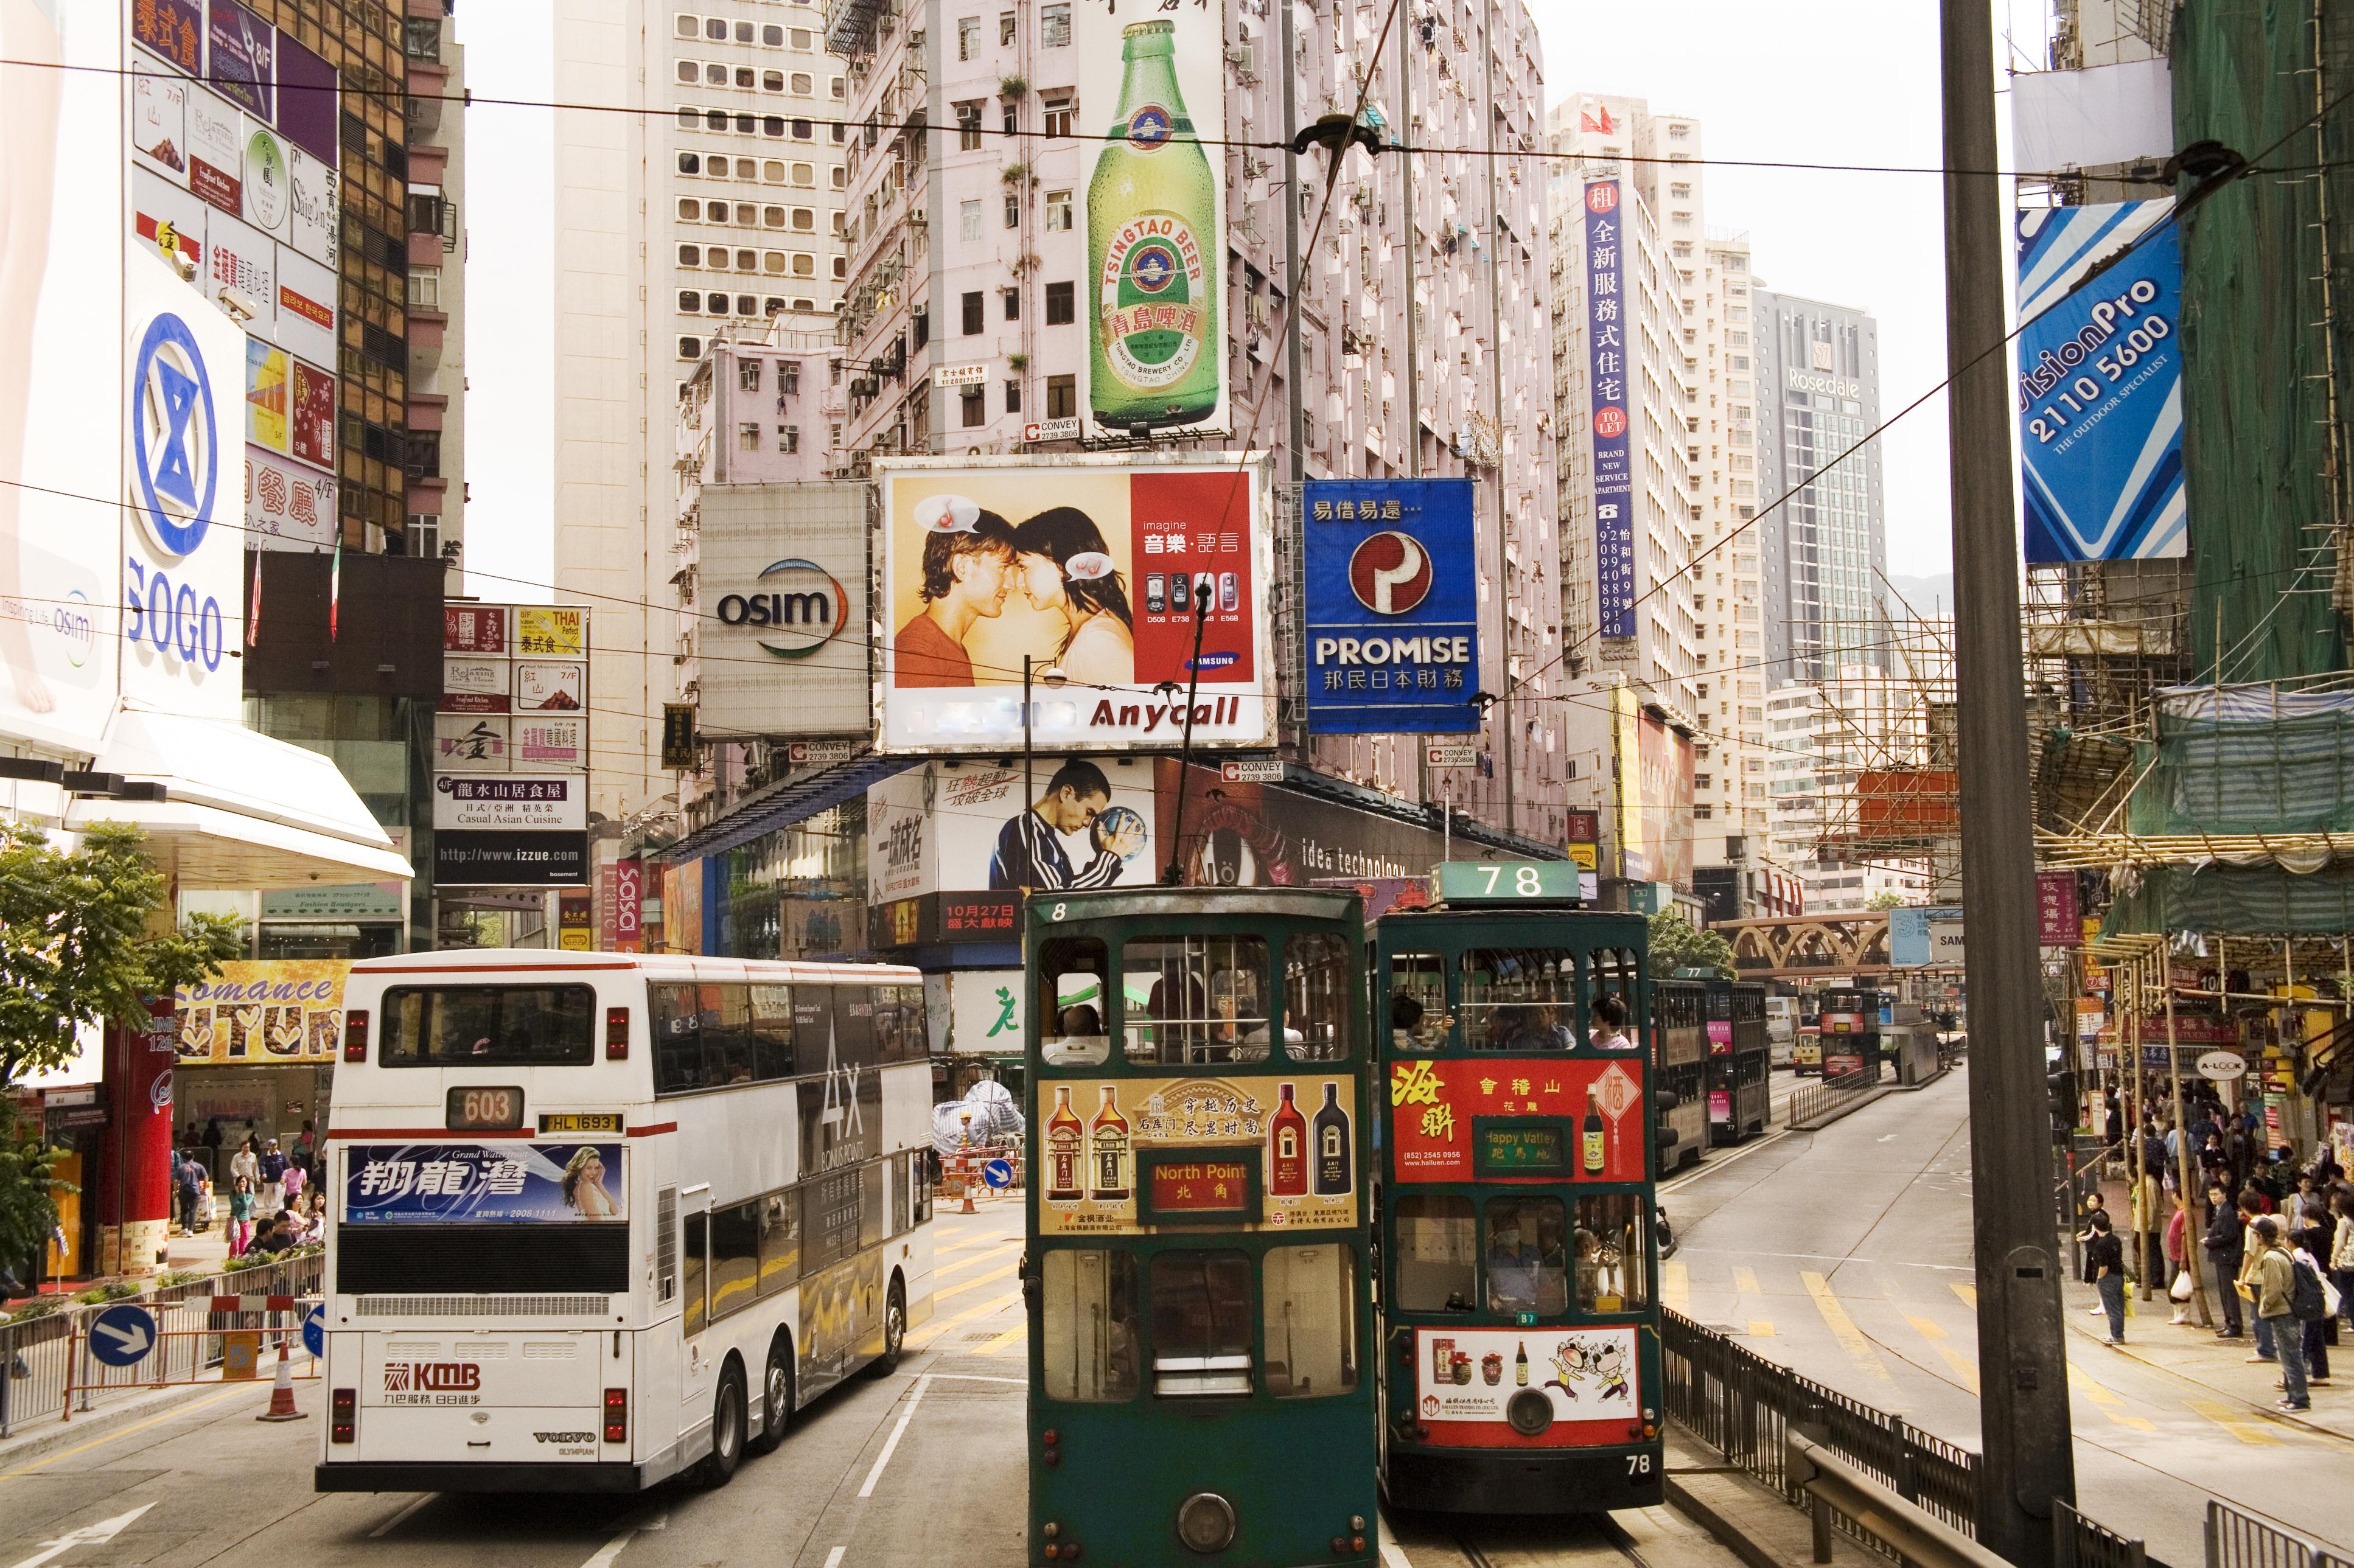 Hong Kong - AspirantSG